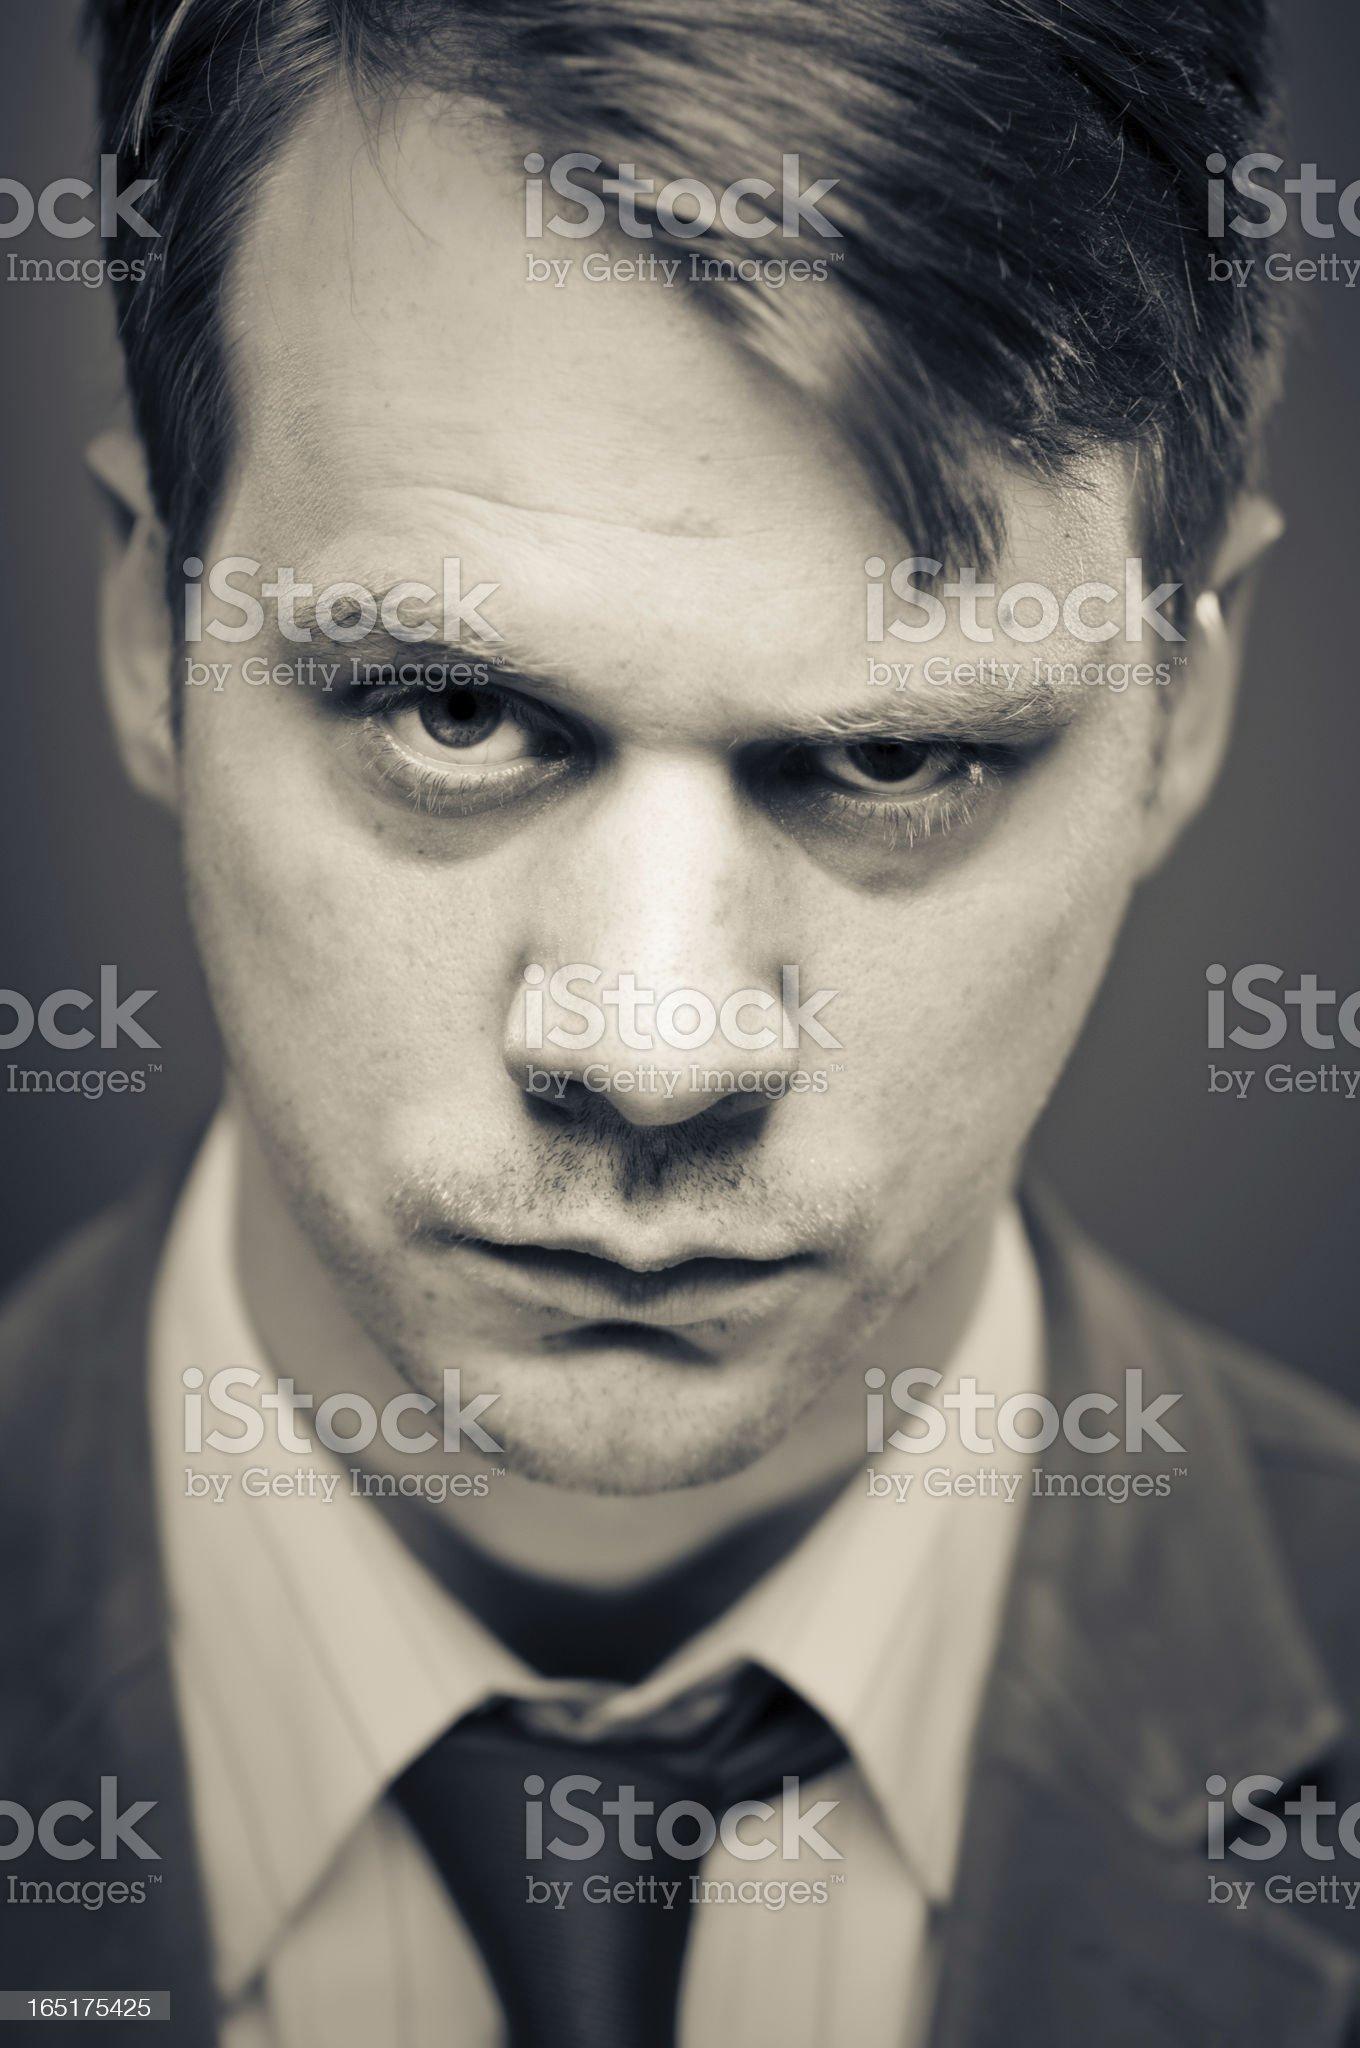 Shady Character Portrait royalty-free stock photo